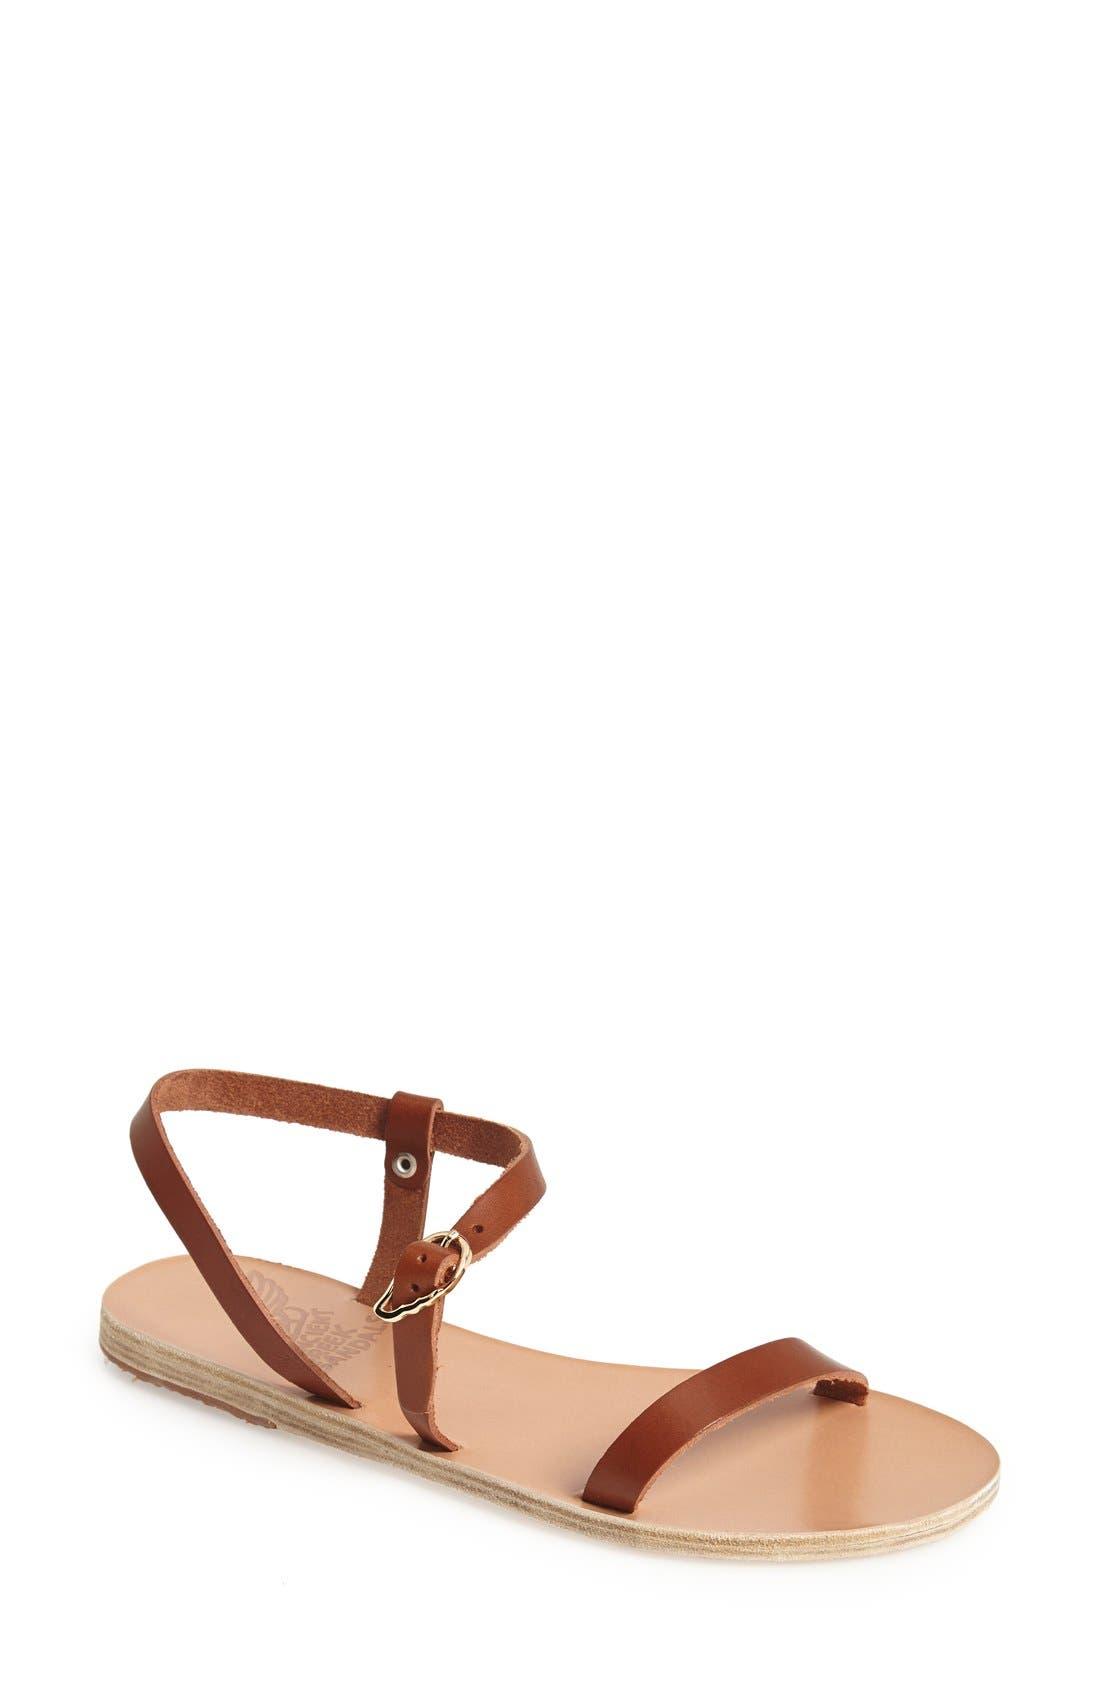 Main Image - Ancient Greek Sandals 'Niove' Leather Sandal (Women)